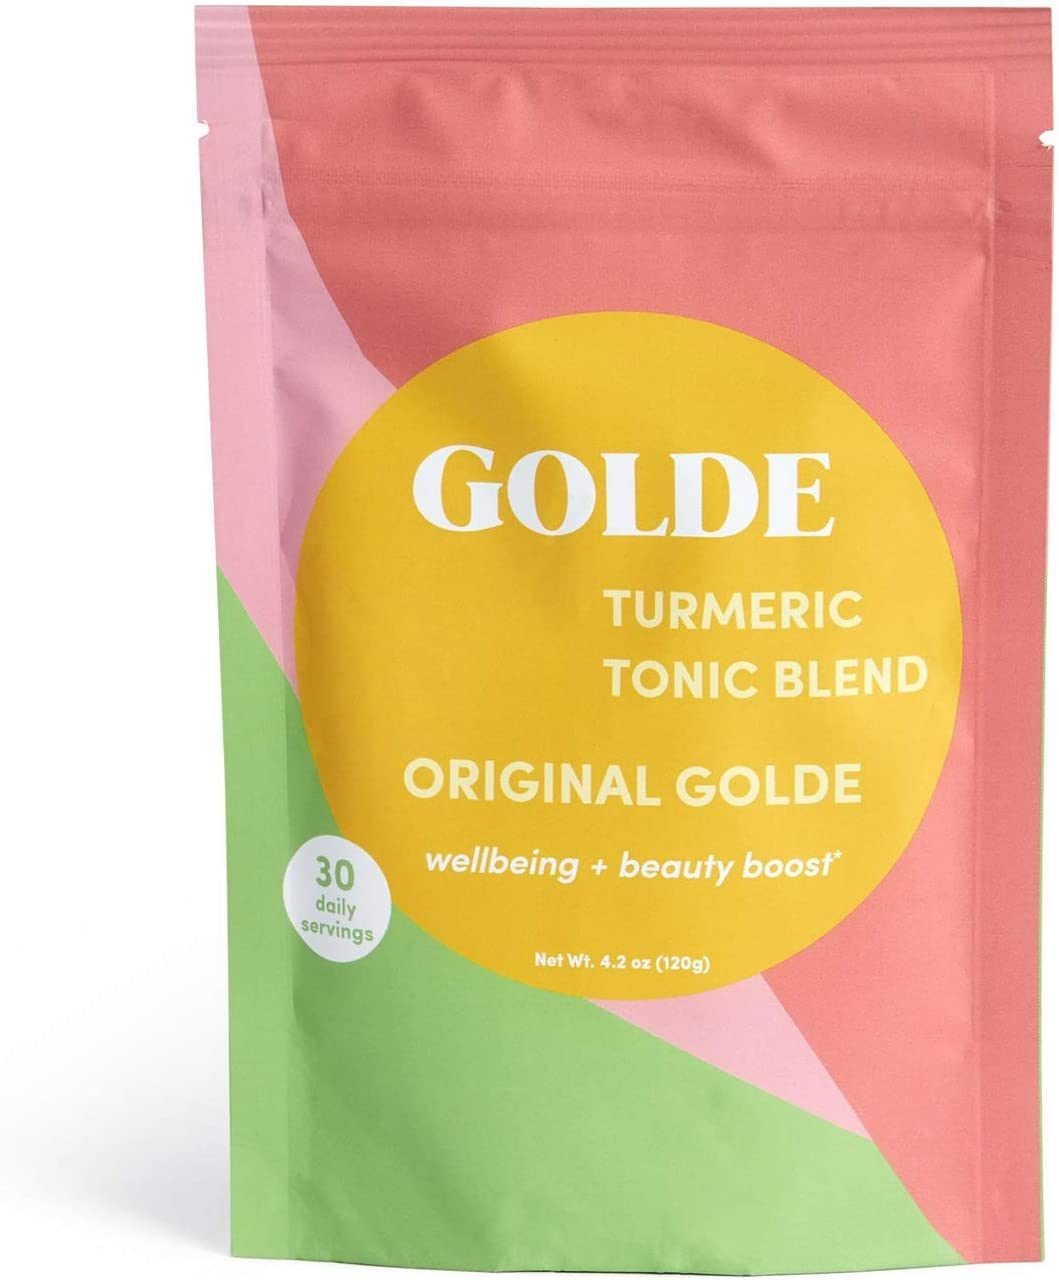 Original GOLDE Turmeric Tonic Blend Wellness Vegan San Antonio Mall Turmeri Ranking TOP20